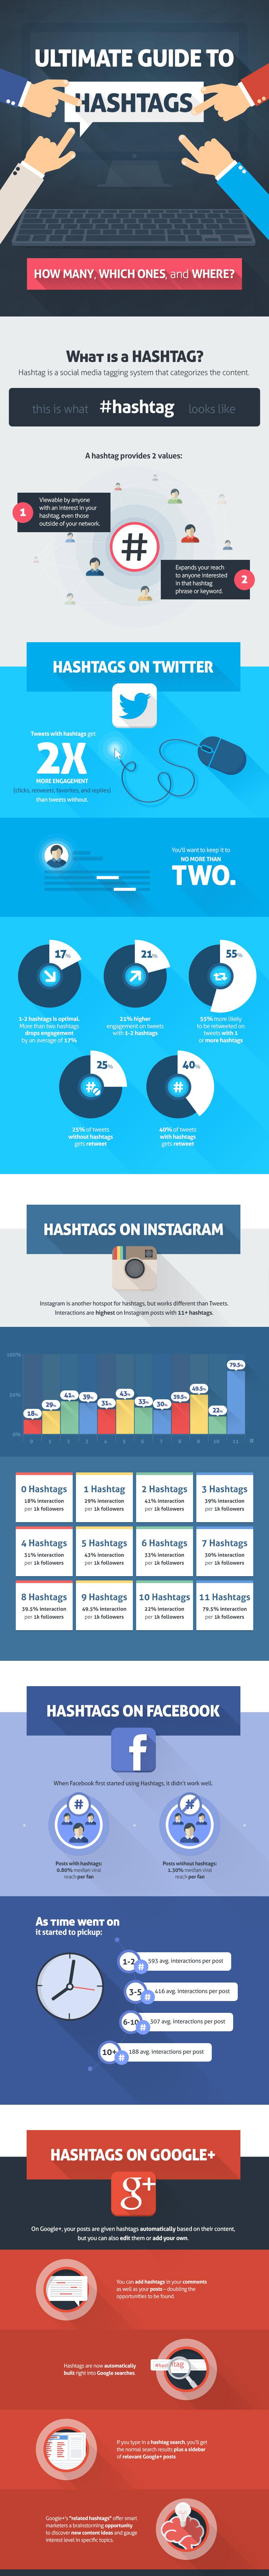 utilizarea-hashtaguri-hastag-social-media-instagram-twitter